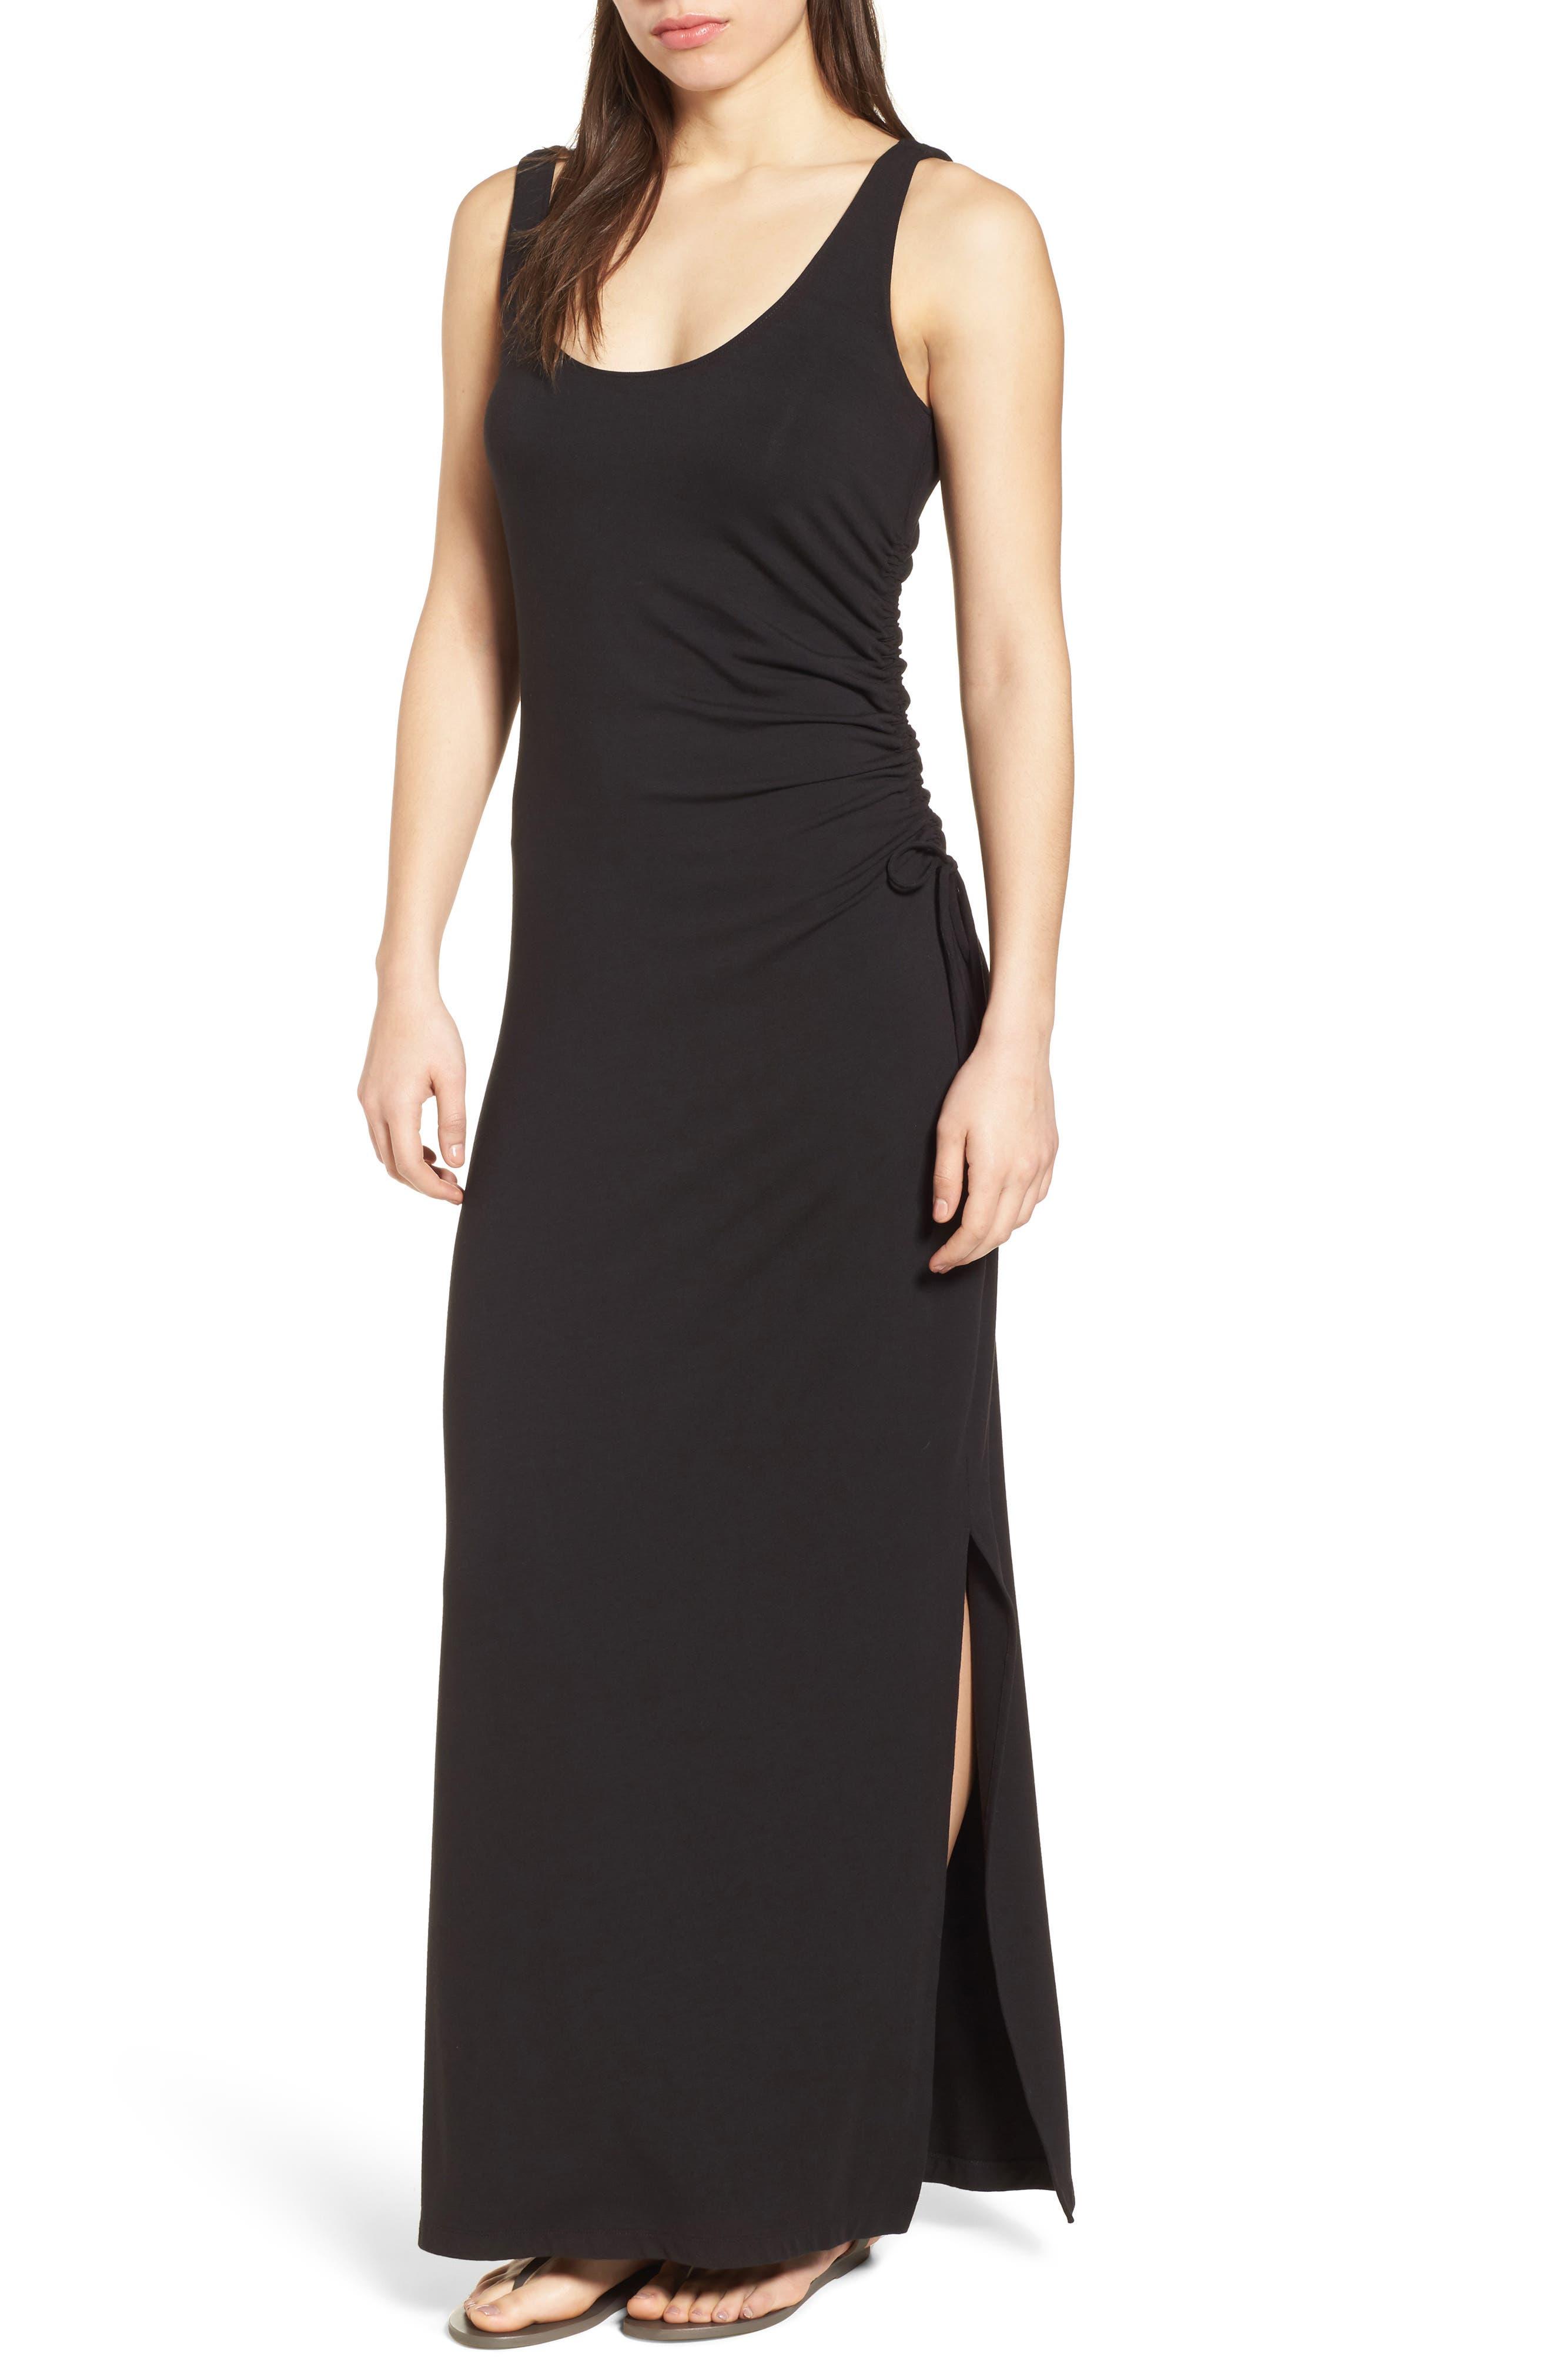 Tambour Shirred Maxi Dress,                         Main,                         color, Black